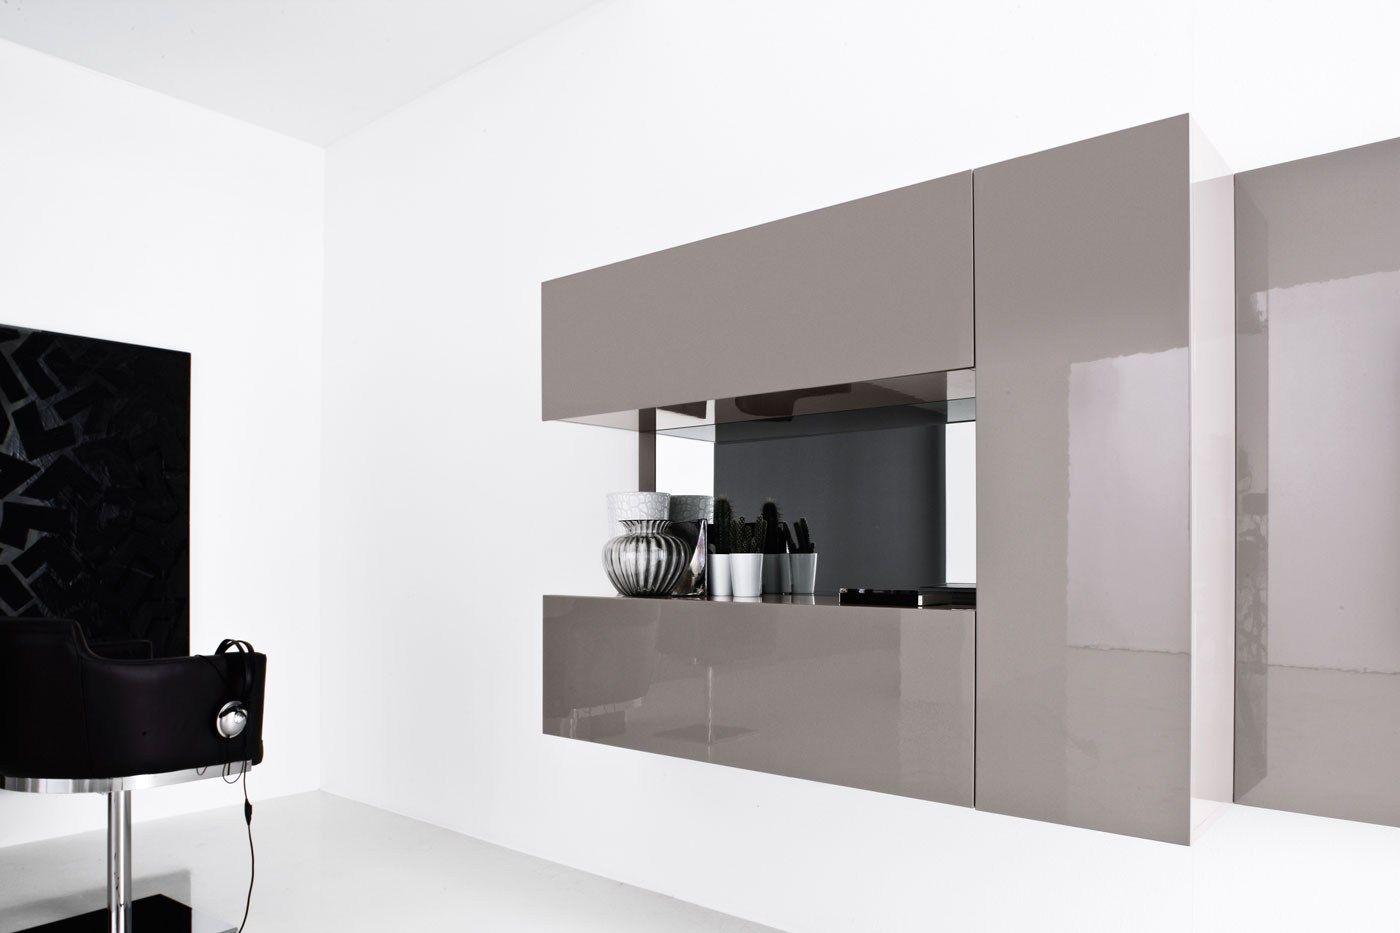 Wohnwand modern italian interessante ideen for Wohnwand italian design